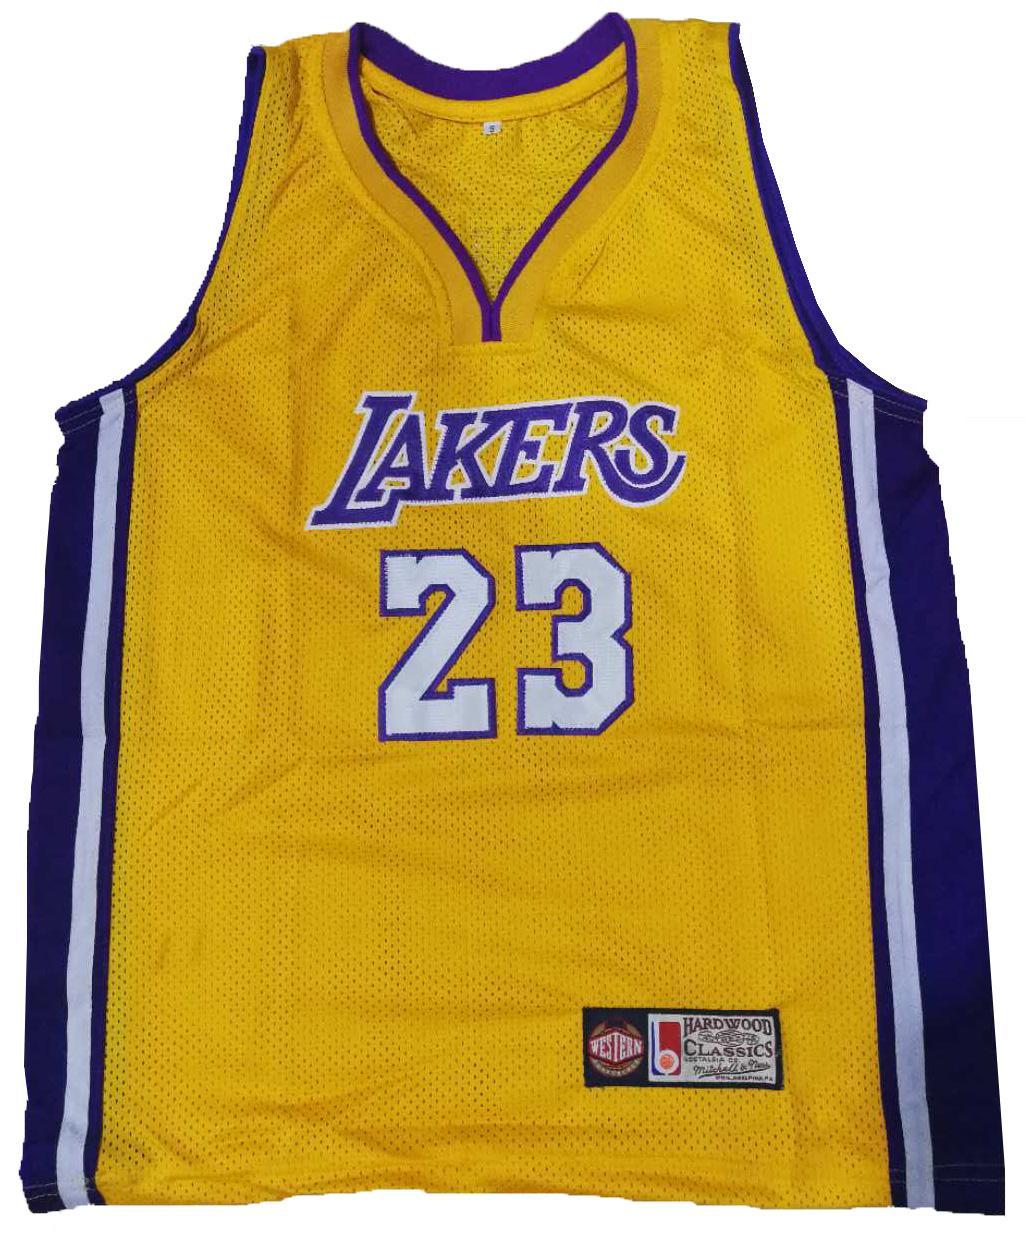 595bc059f Lakers 23 lebron james basketball jersey sando (yellow) Big Deal na ...